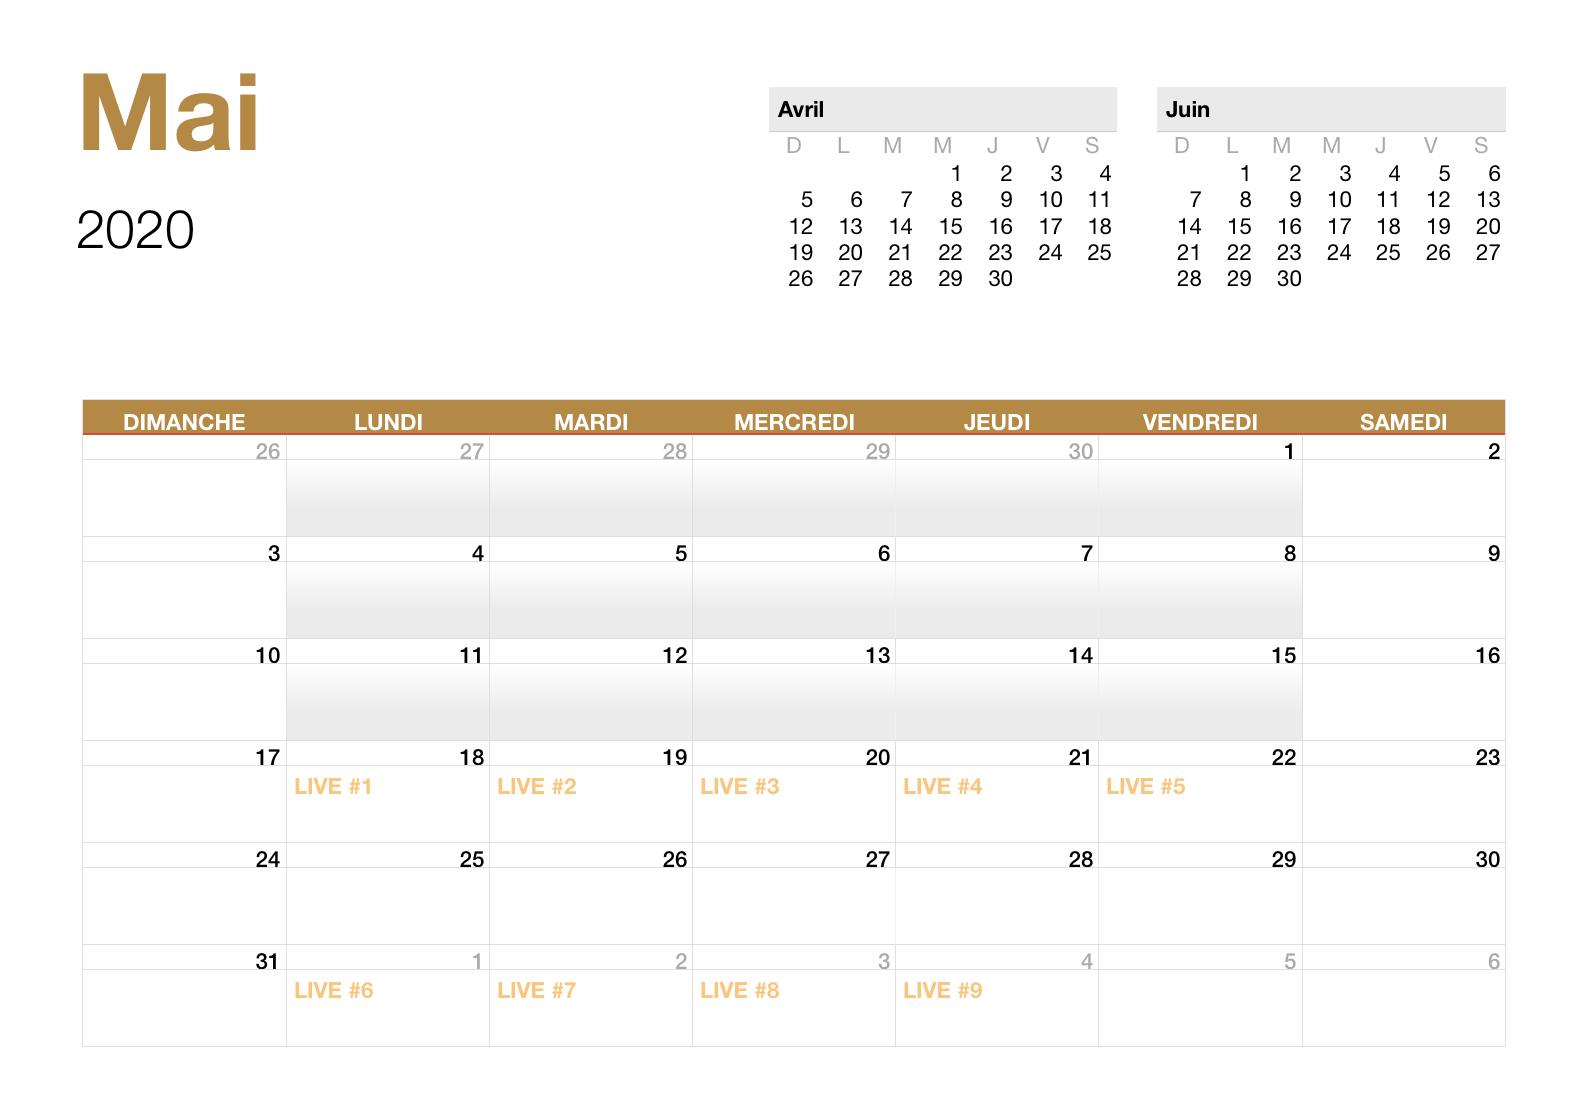 Mai - 2020